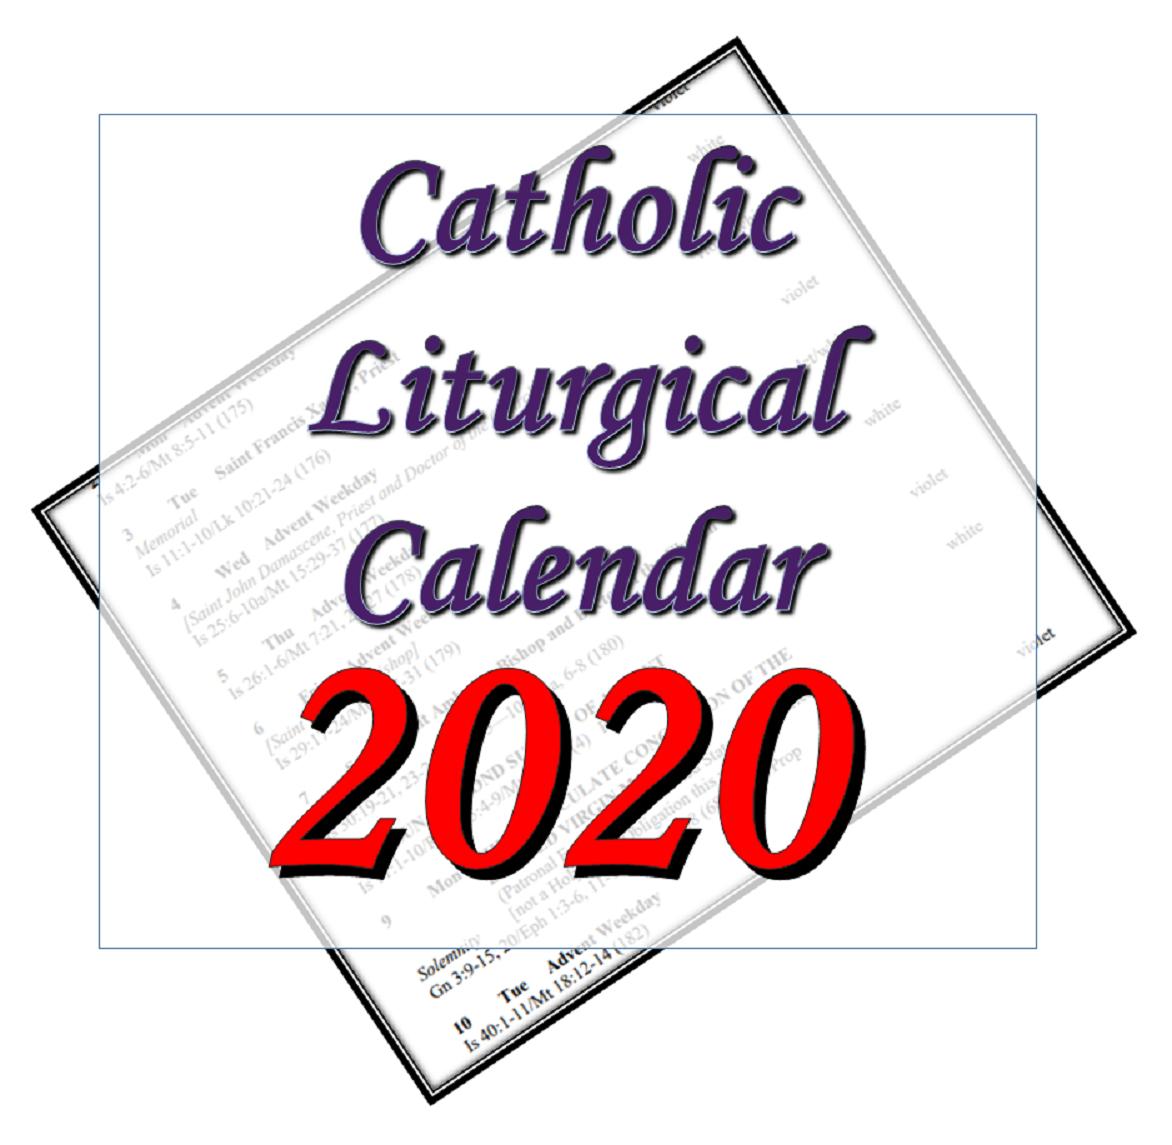 Liturgytools: Catholic Liturgical Calendars For 2020